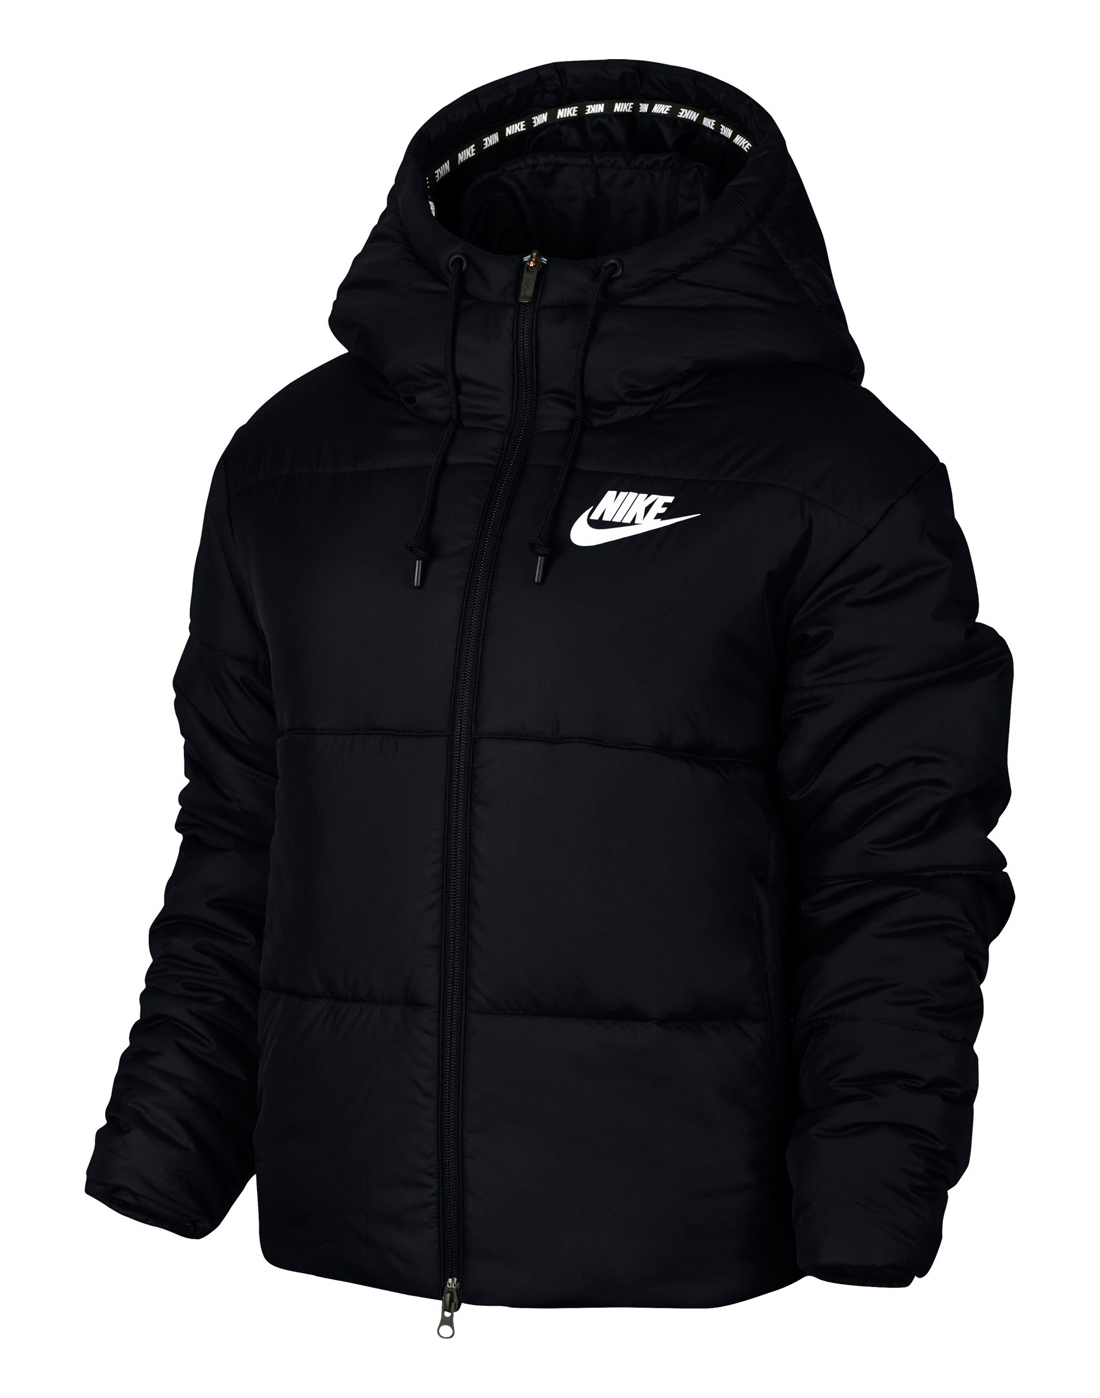 2c10e64faf79 Nike Womens Puffa Jacket